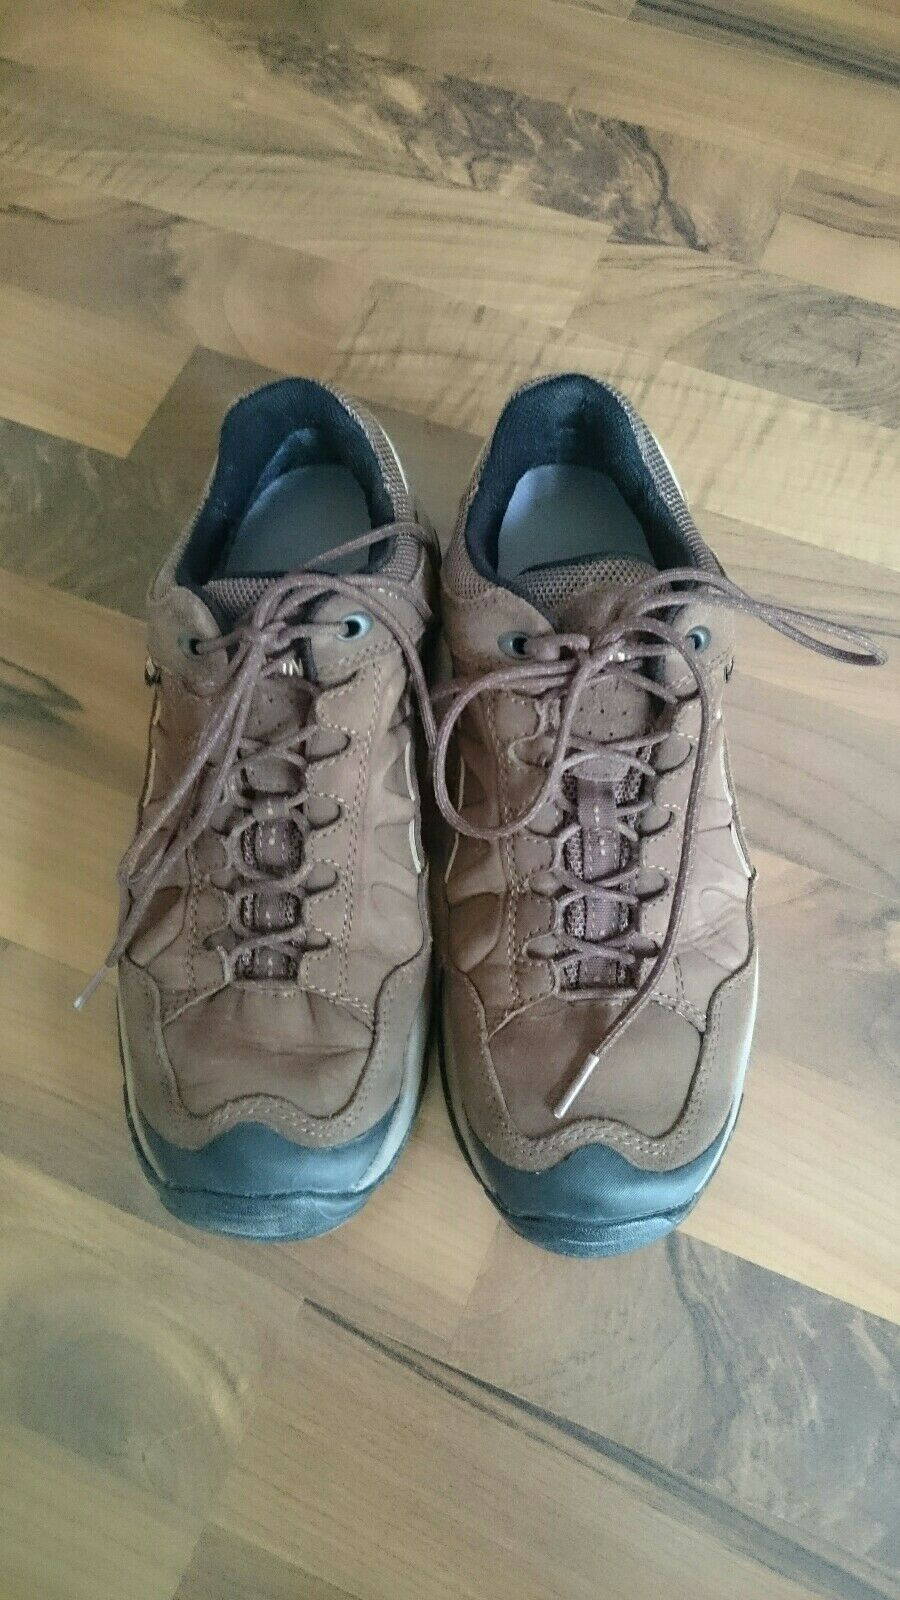 Meindl Trekking Schuhe Gr. 38,5